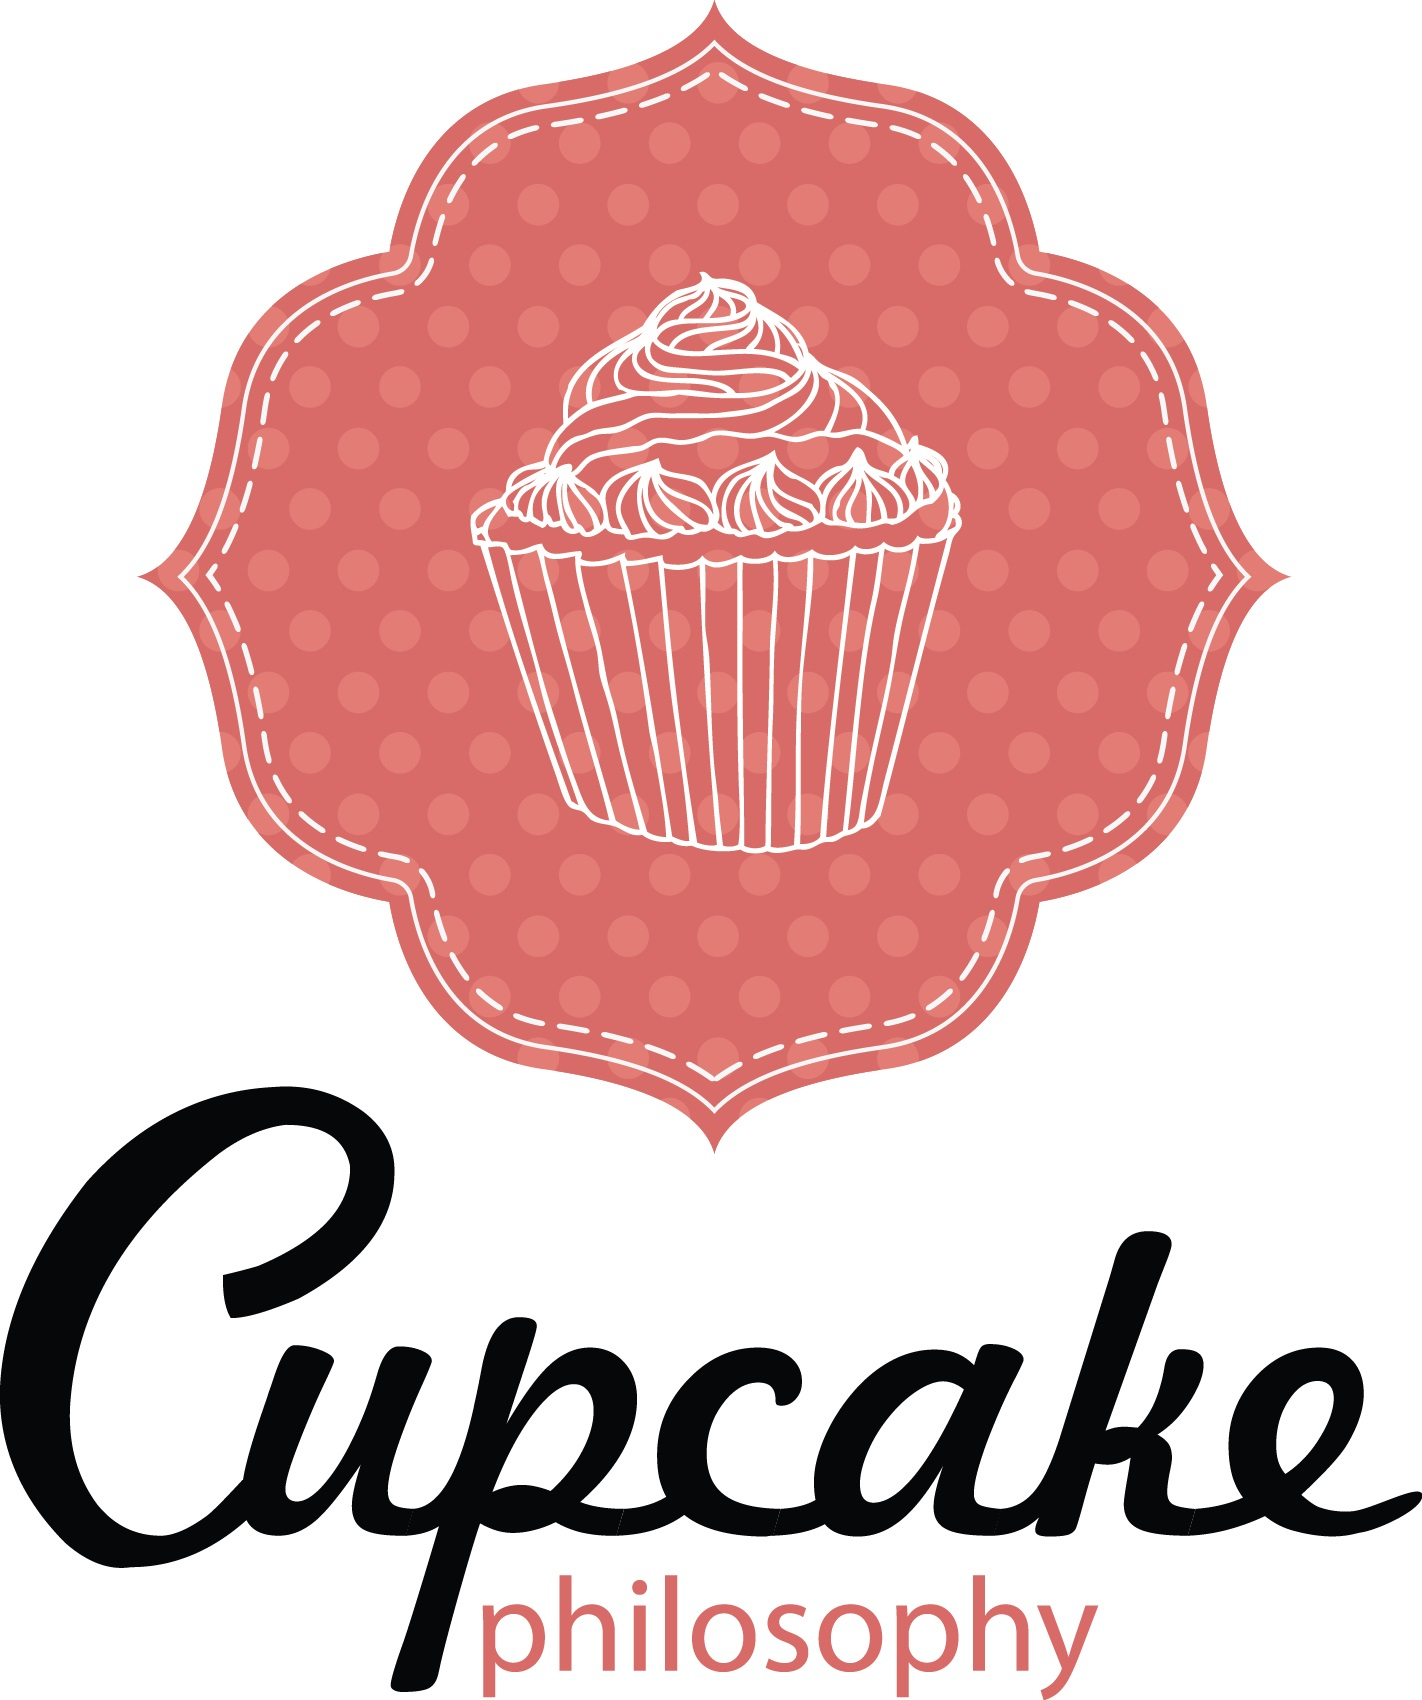 Cupcake Philosophy